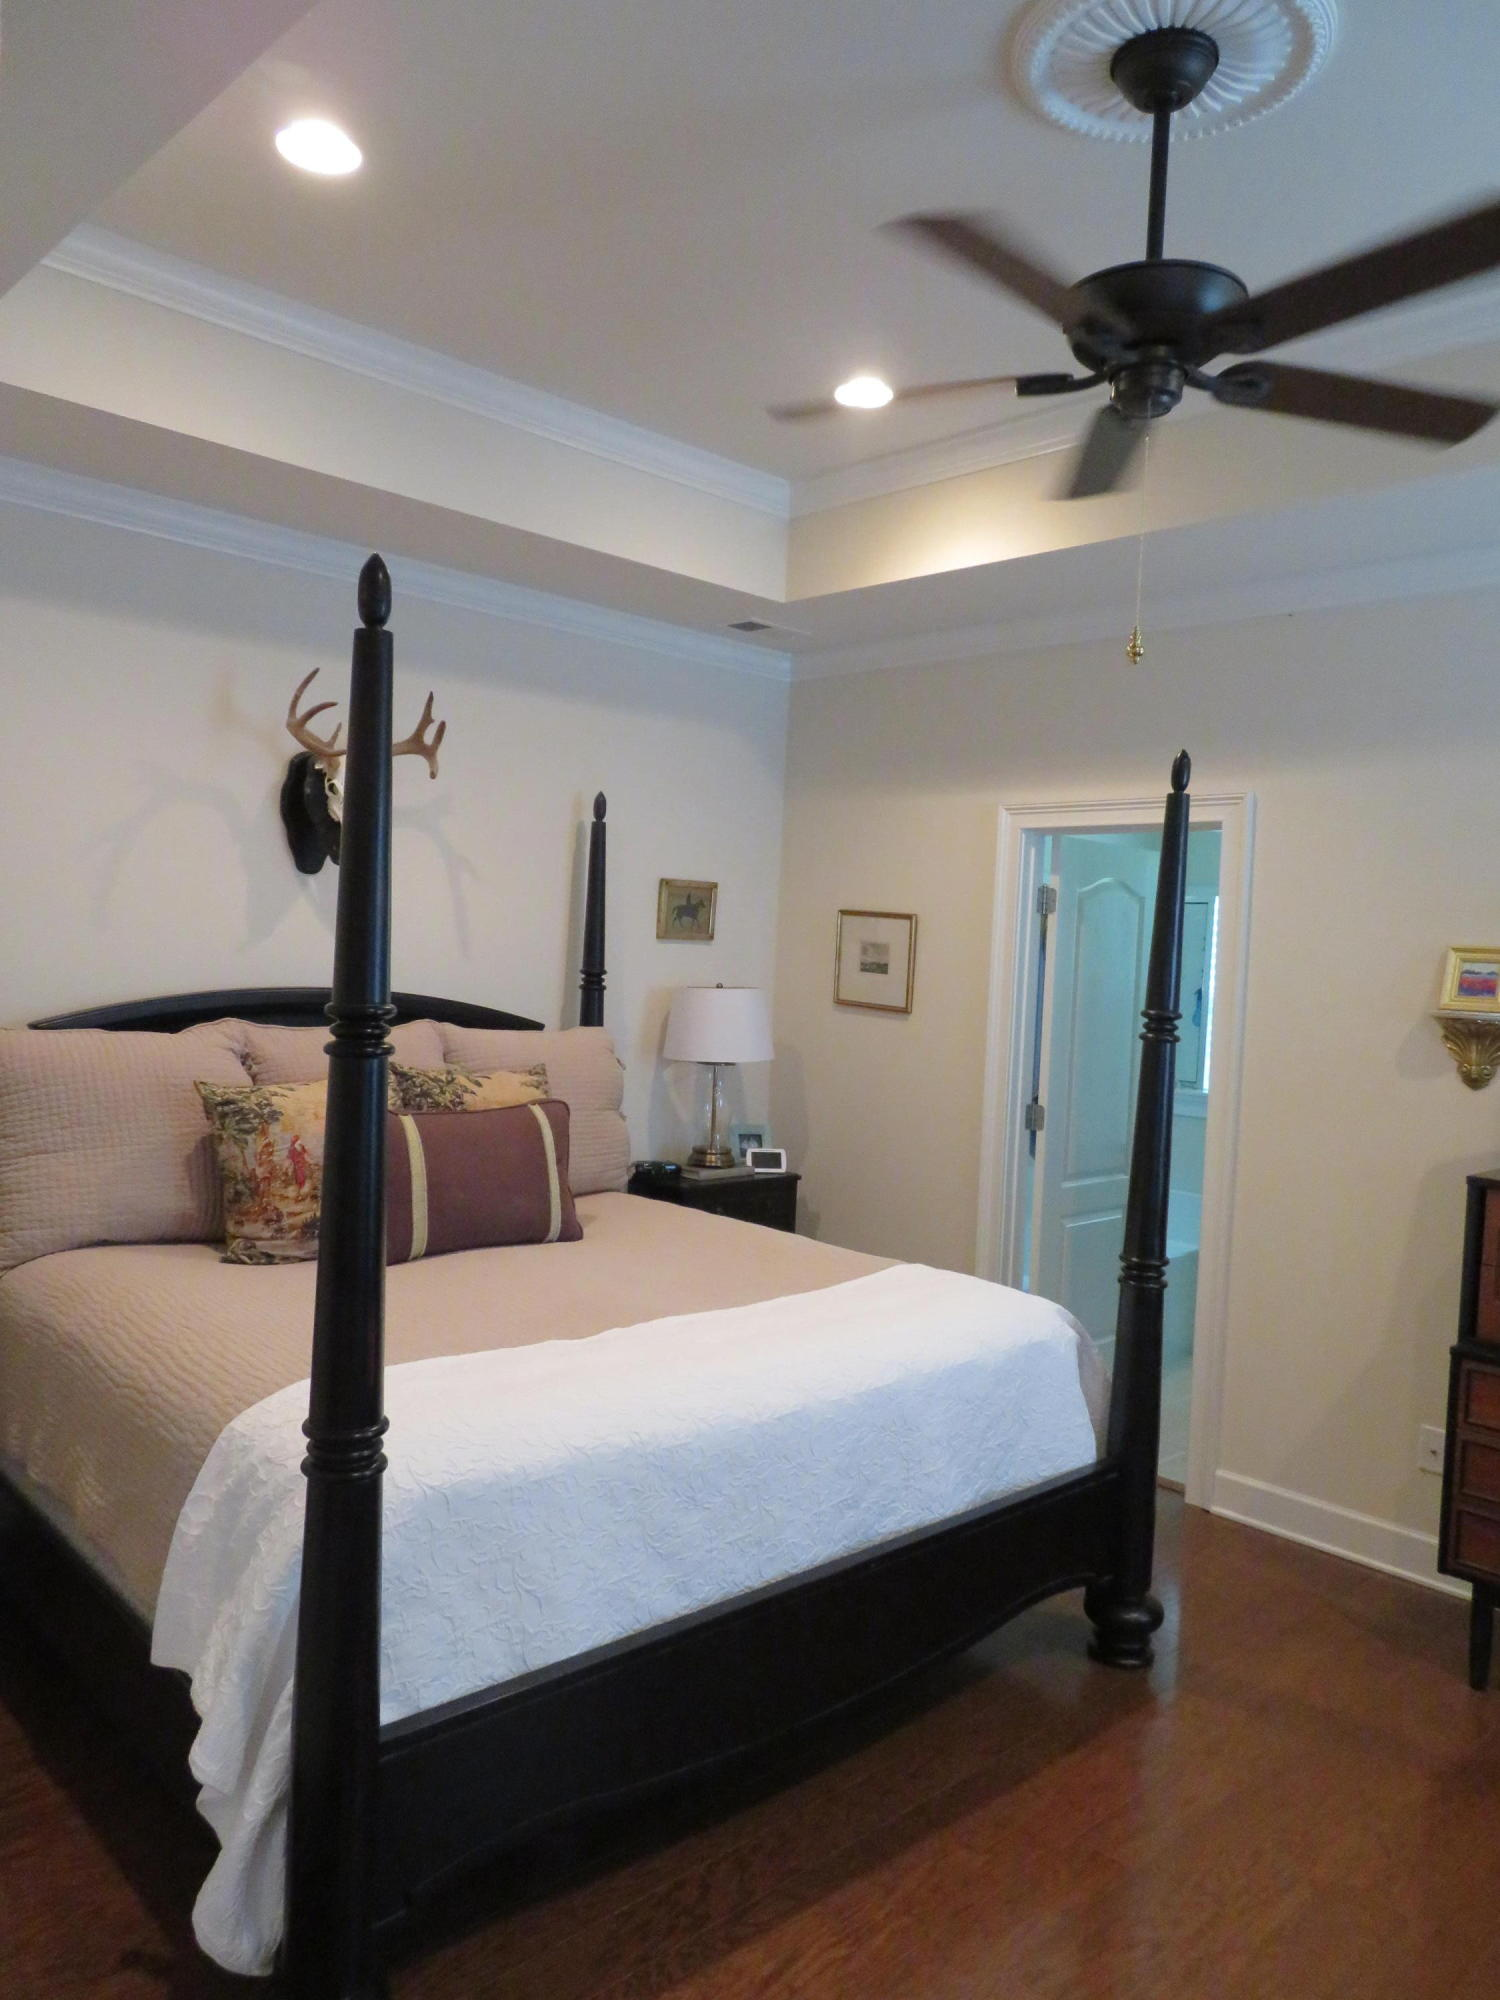 Hillside Farms Homes For Sale - 114 Danielle, Summerville, SC - 21